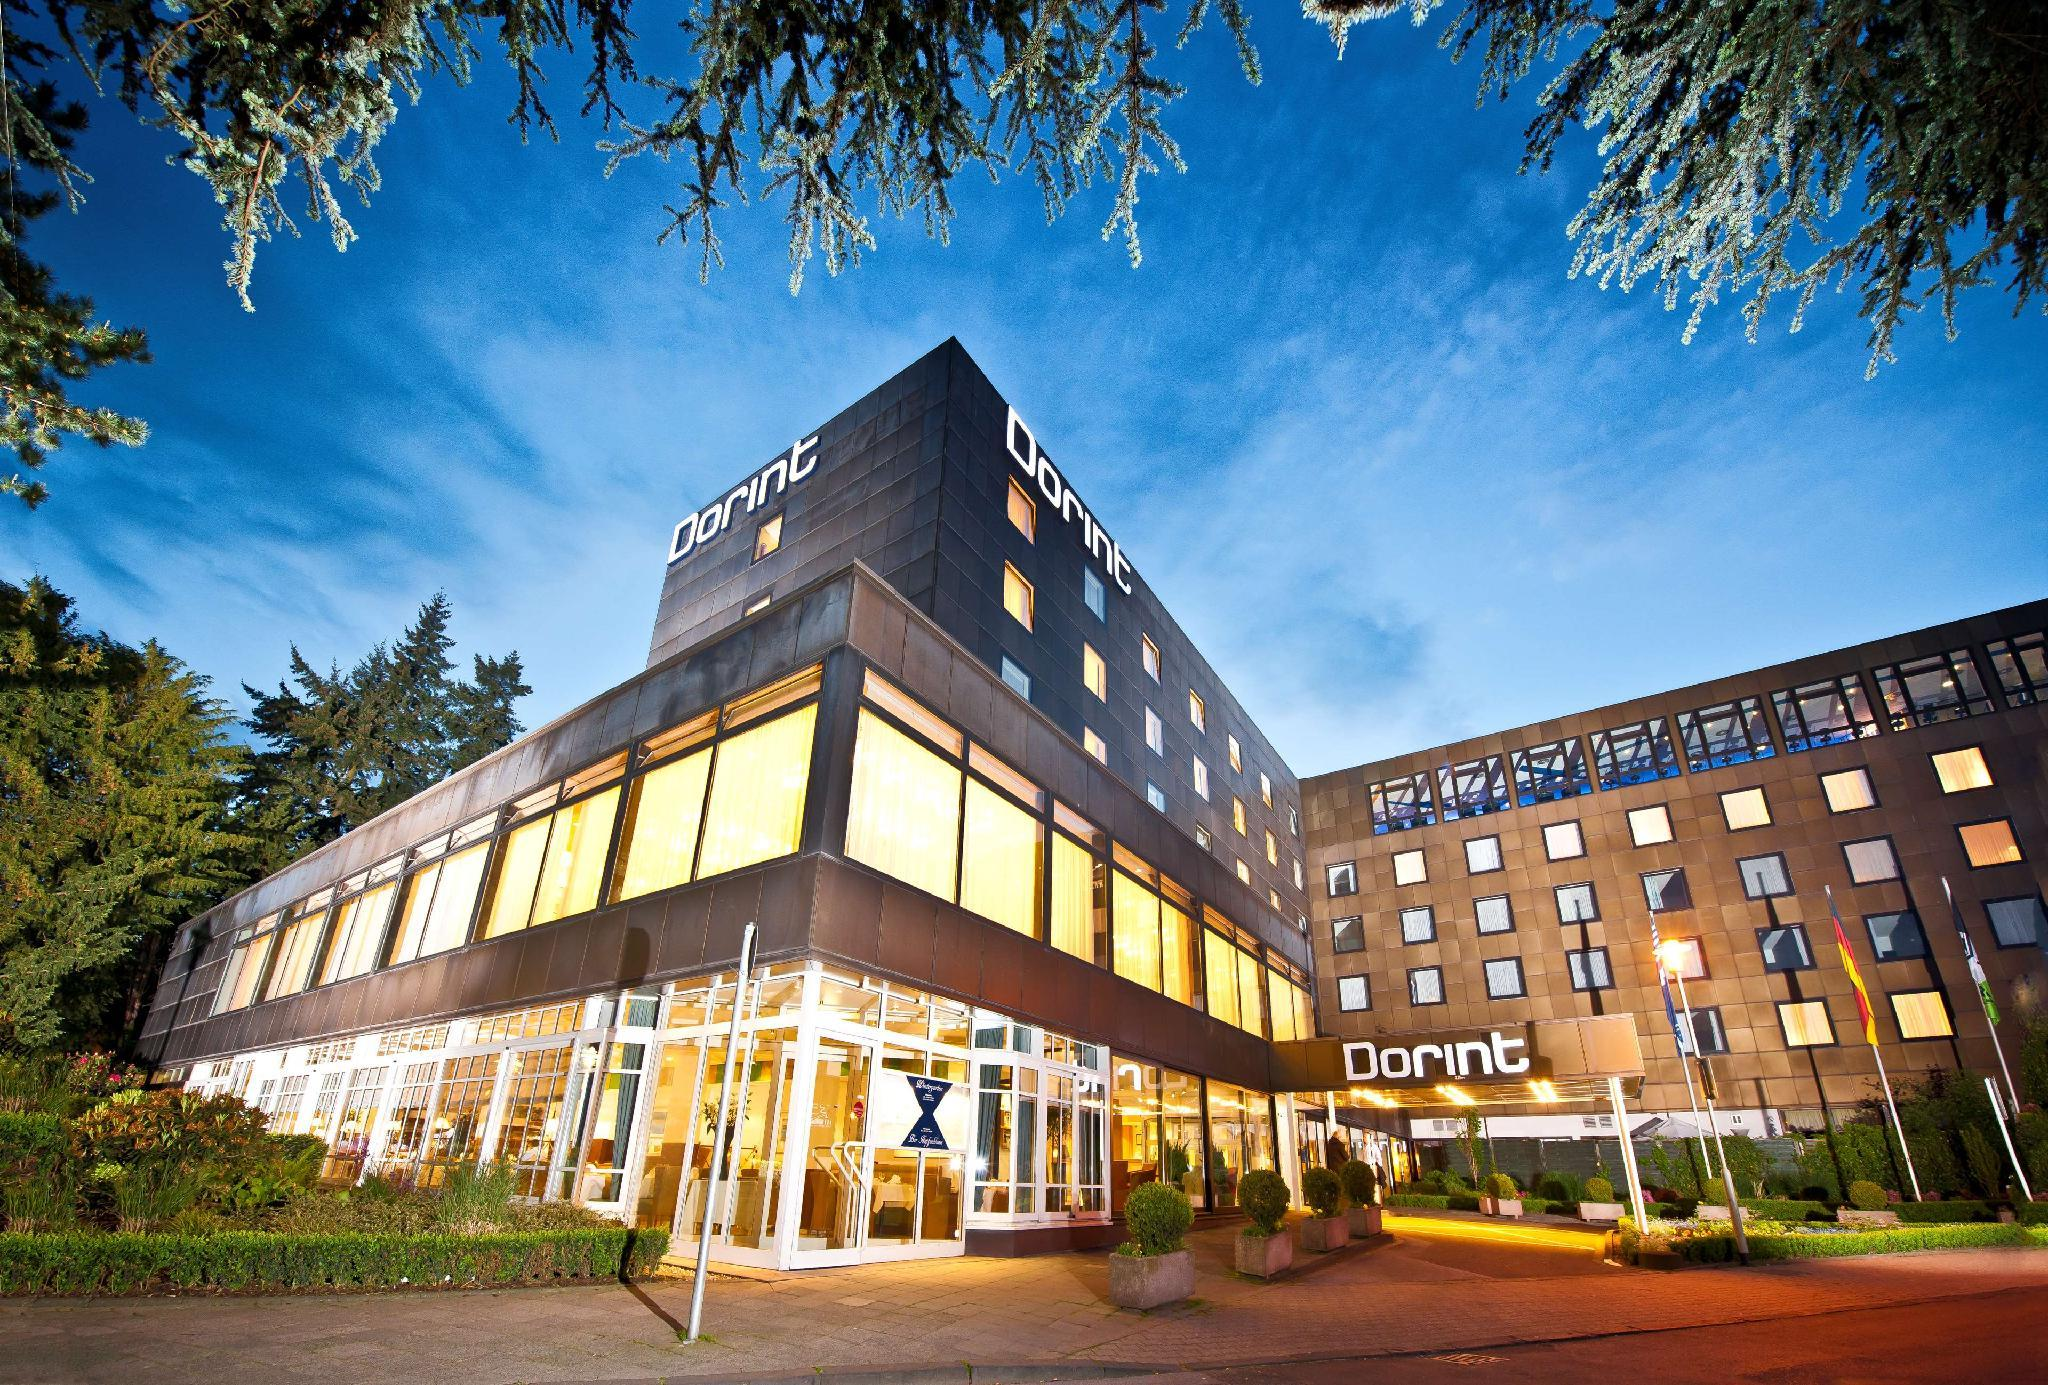 Dorint Parkhotel Moenchengladbach